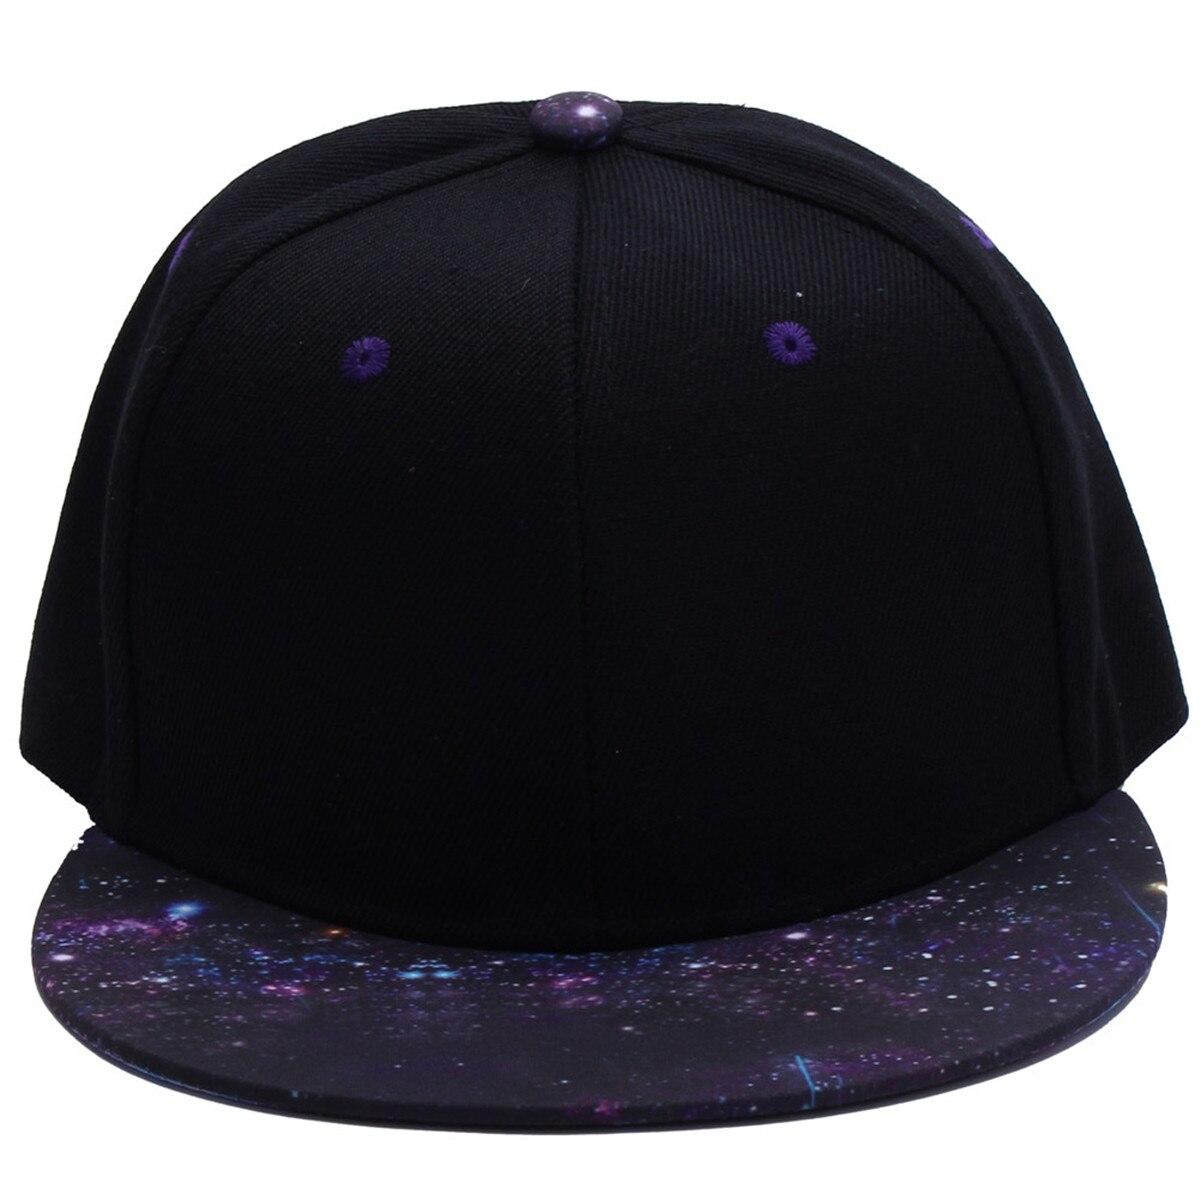 Unisex Fashion Baseball Cap Women Snapback Caps Men Hip Hop Hats Flat-Brimmed Caps